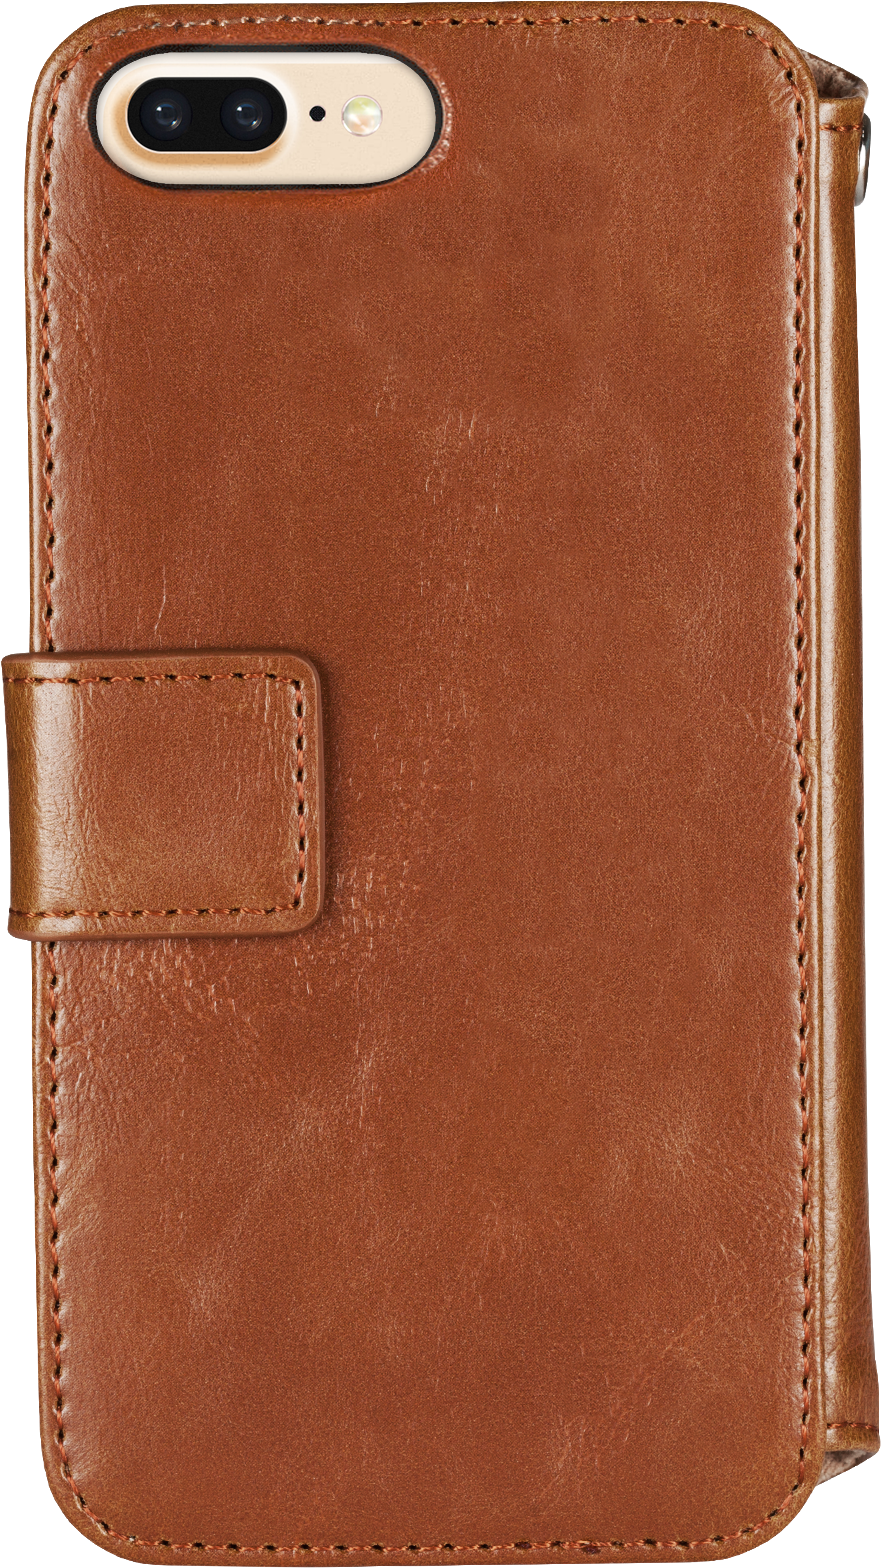 iDeal of Sweden Slim Magnet Wallet (iPhone 8 7 Plus) - iPhonebutiken.se c5b0c332b2d7d